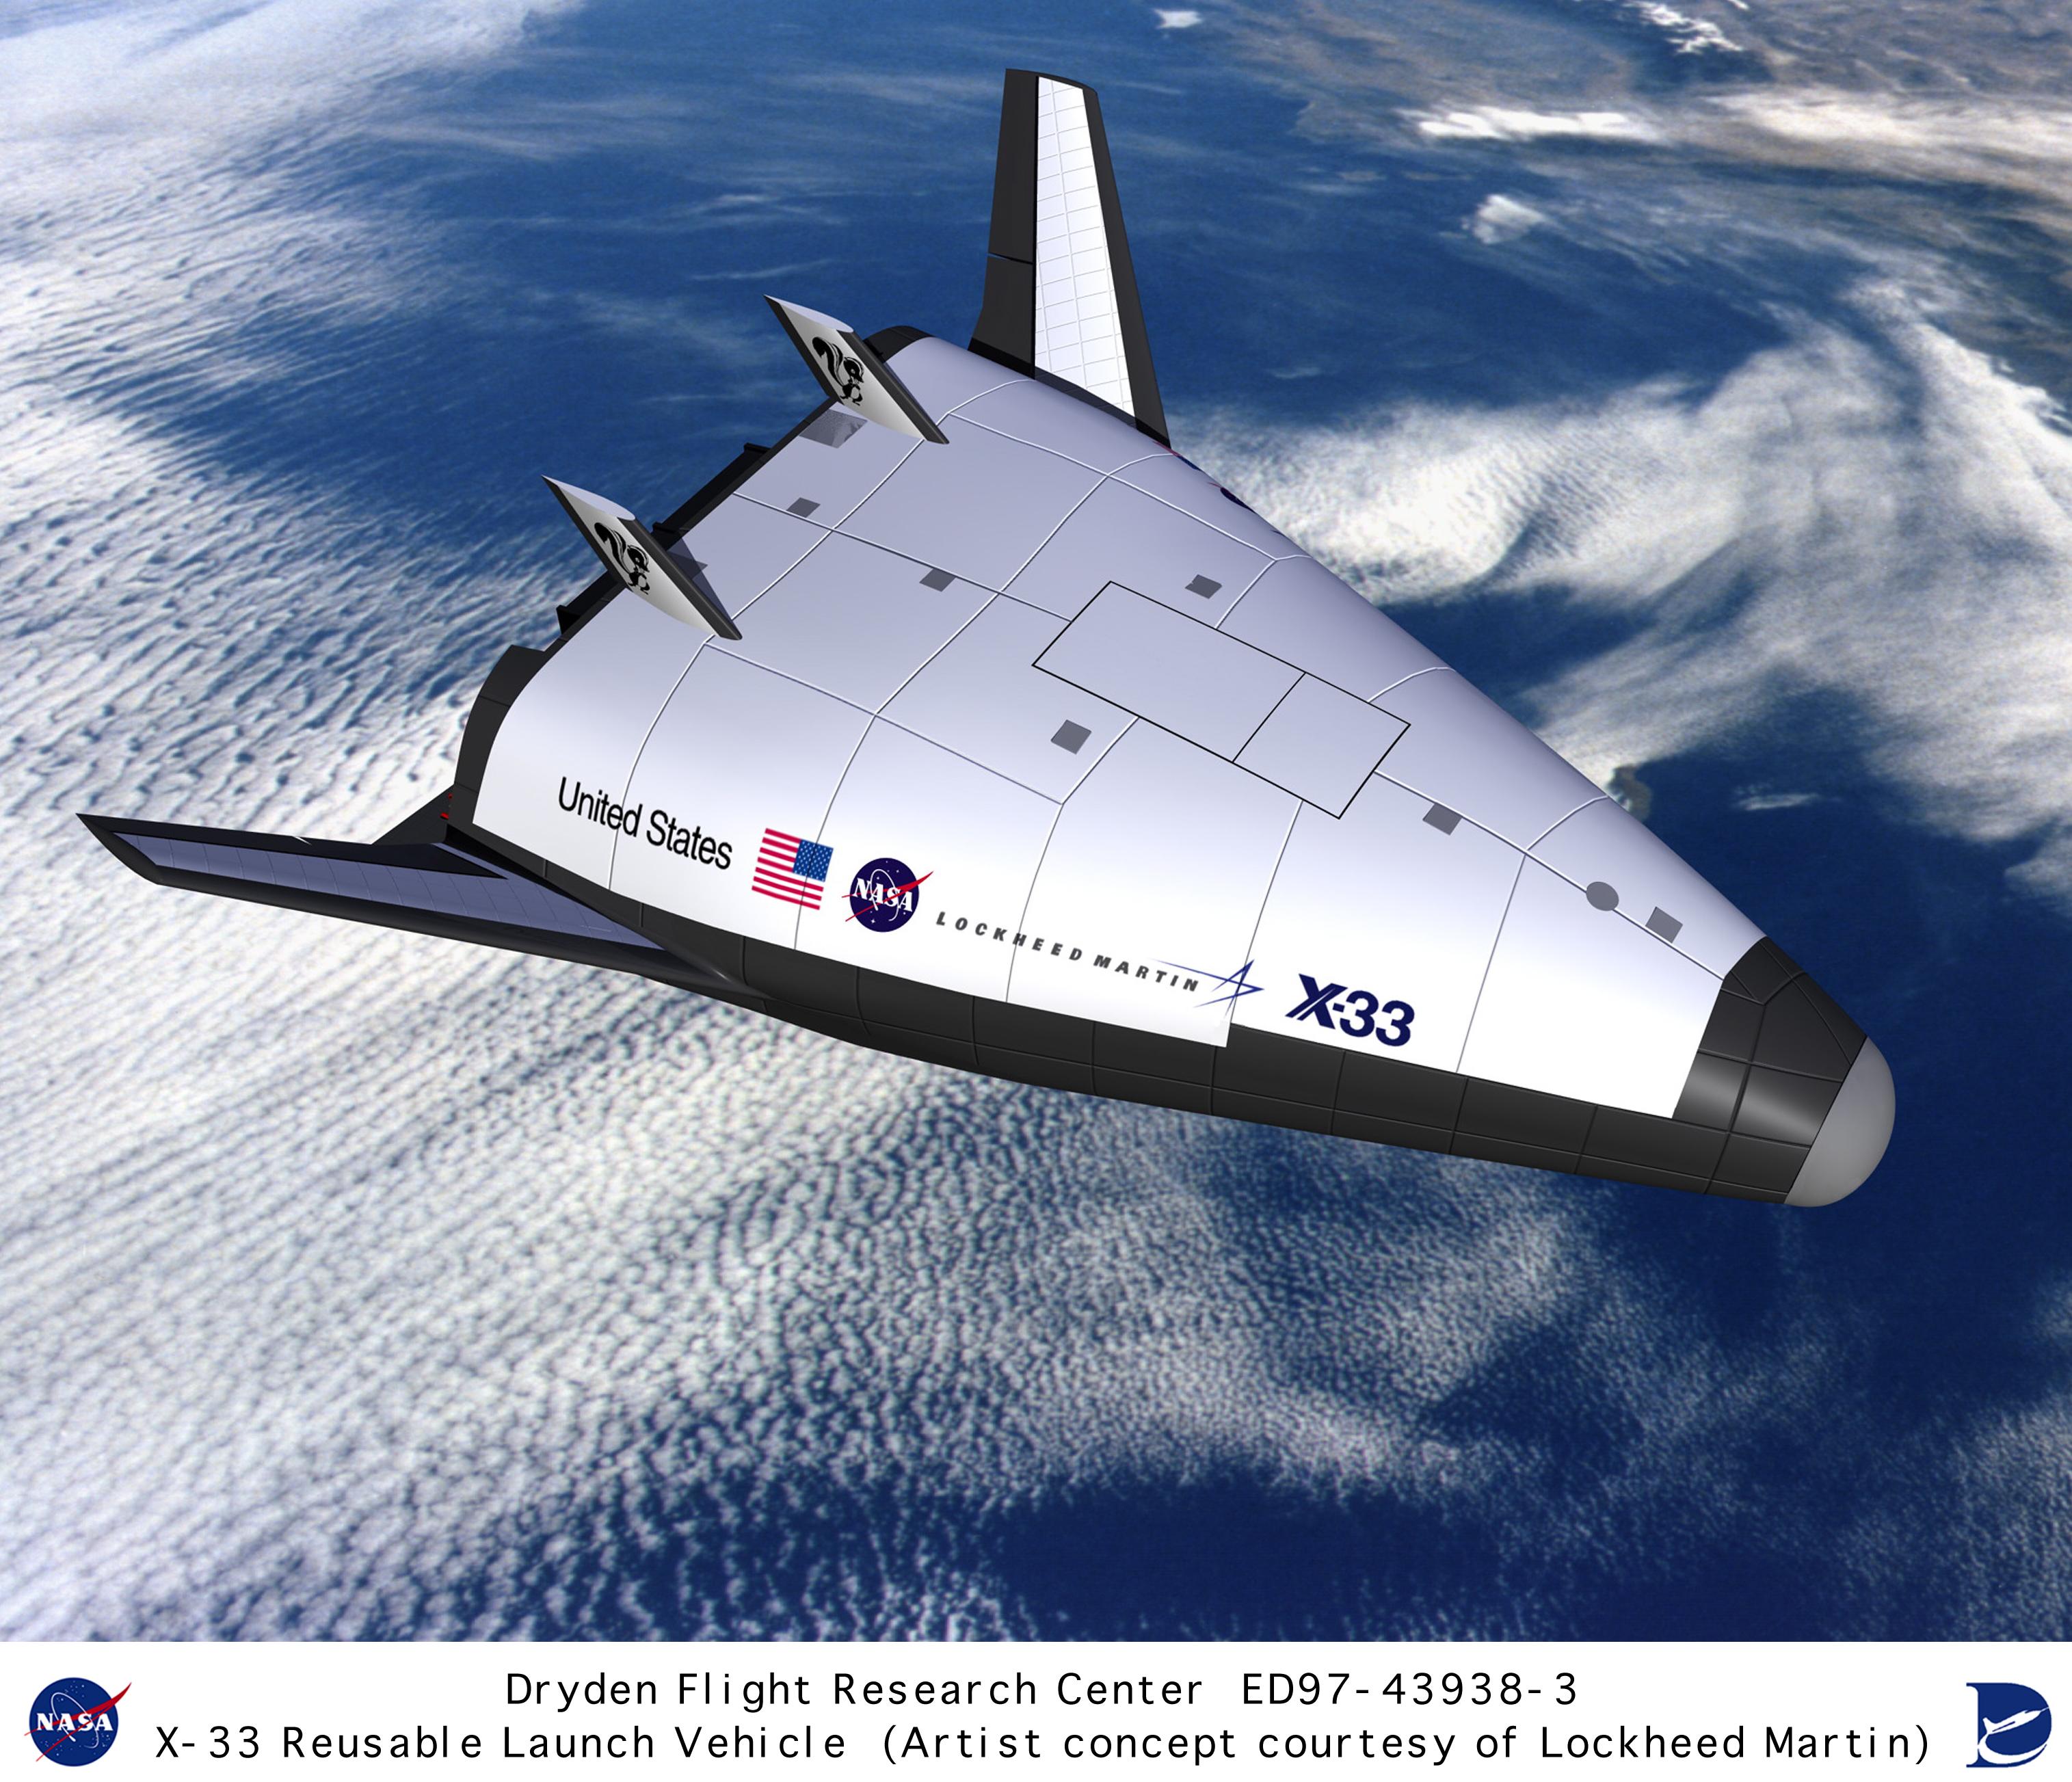 Lockheed Martin X-33